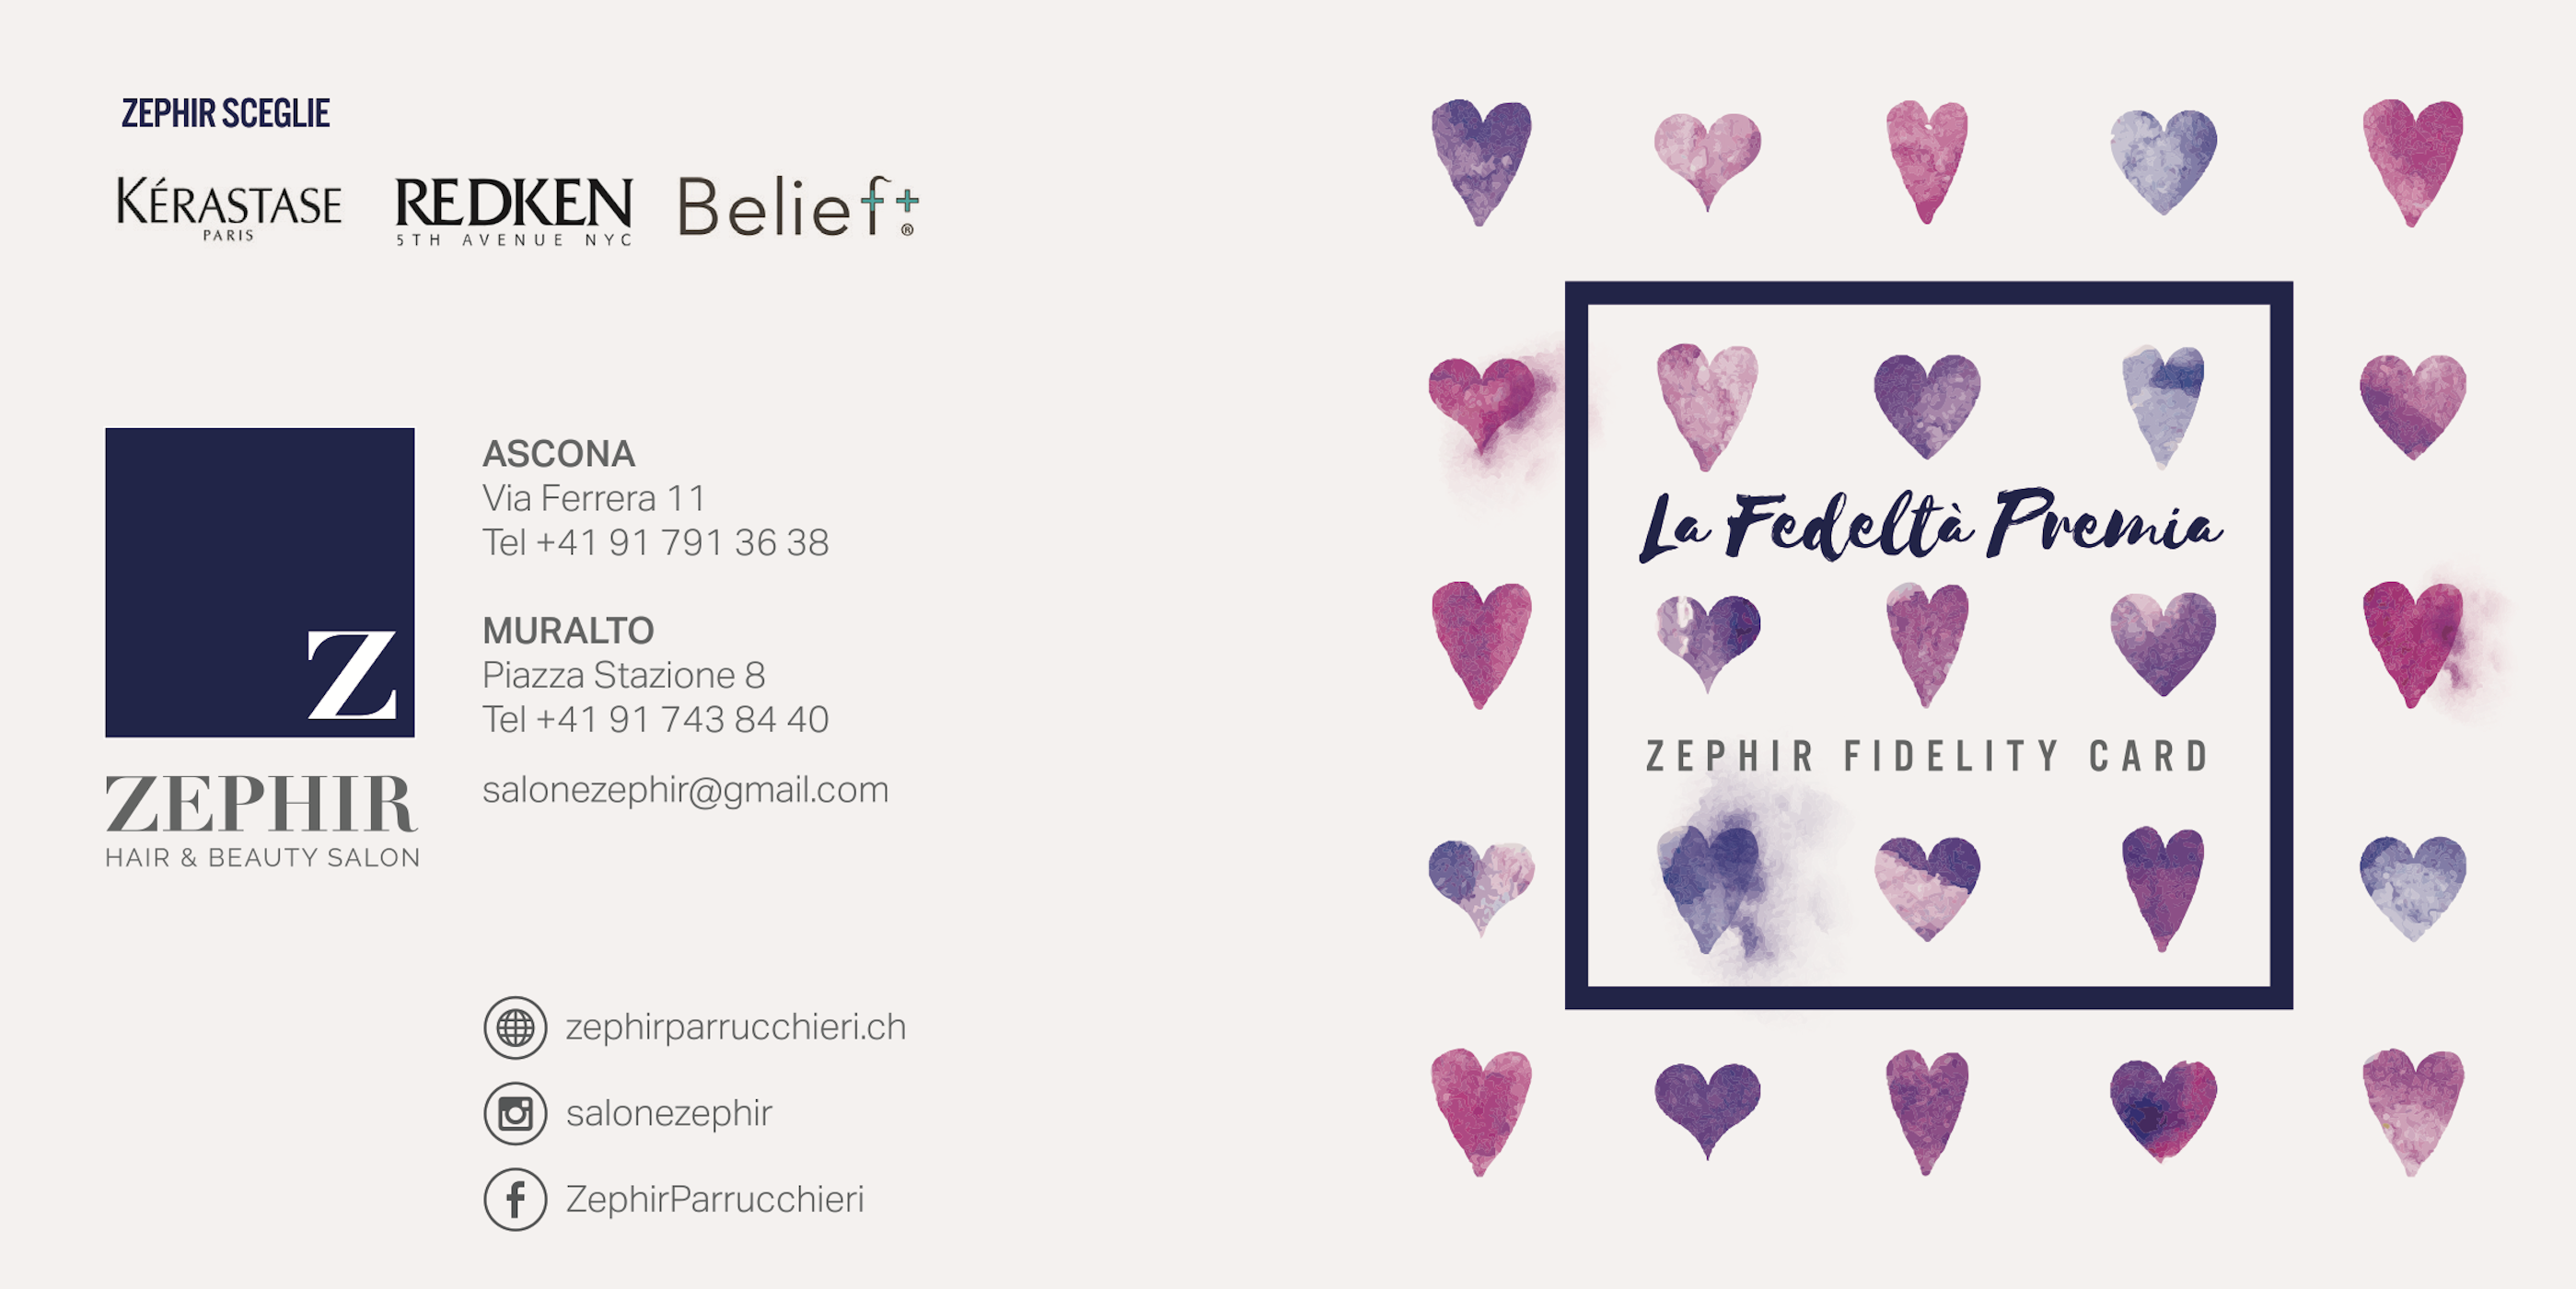 zephirparrucchieri-fidelitycard-ascona